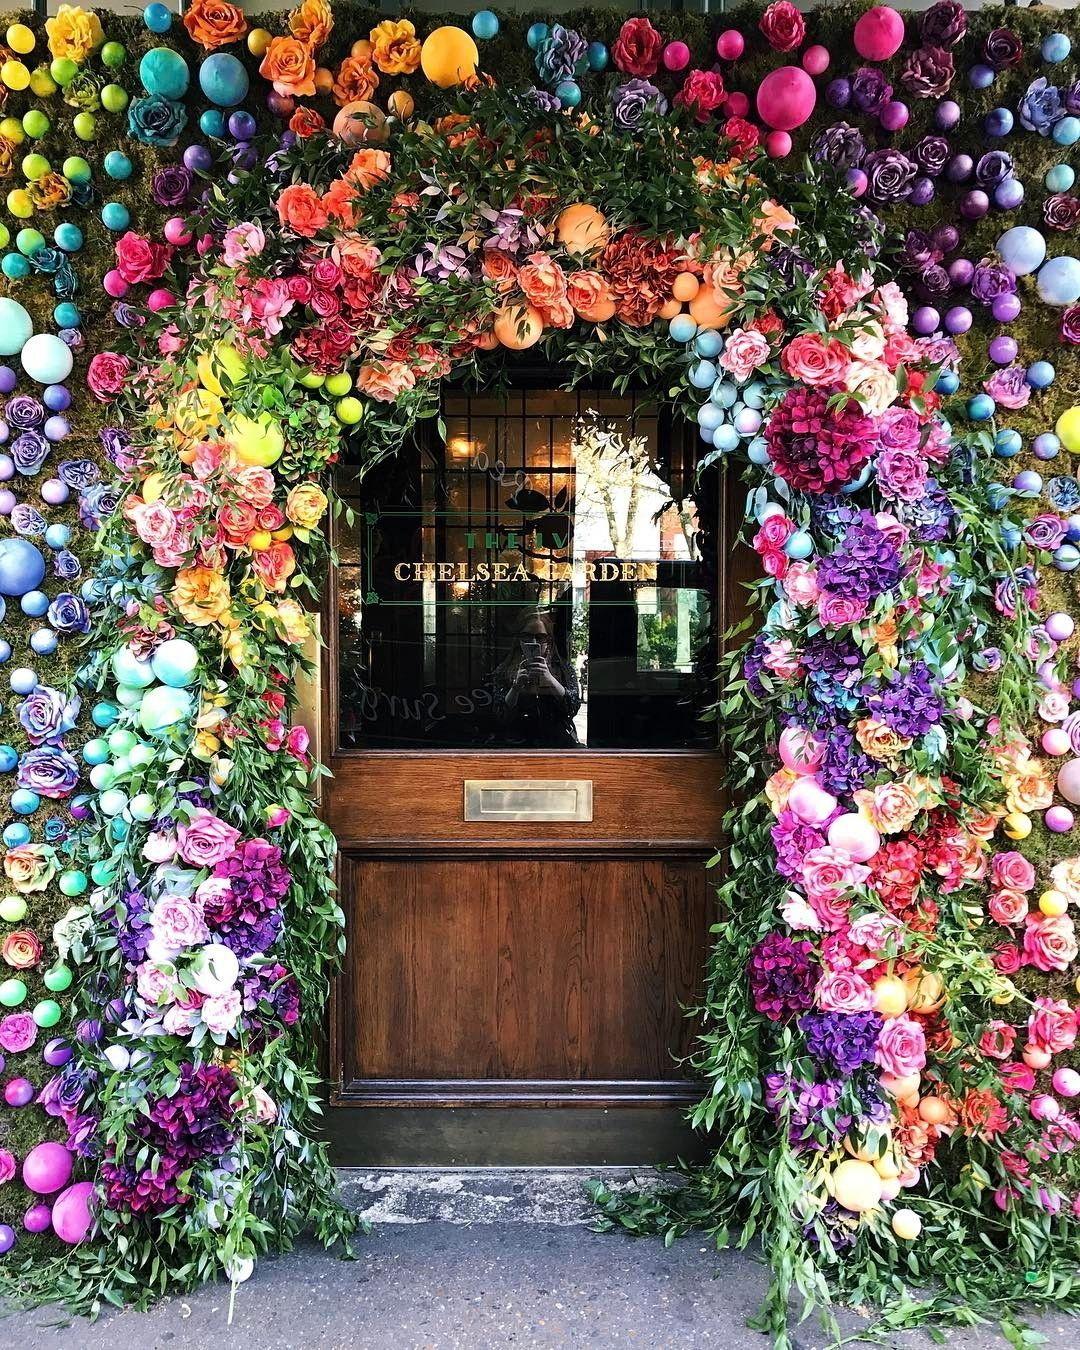 The Ivy Chelsea Garden Grill & Brasserie in London  #menus